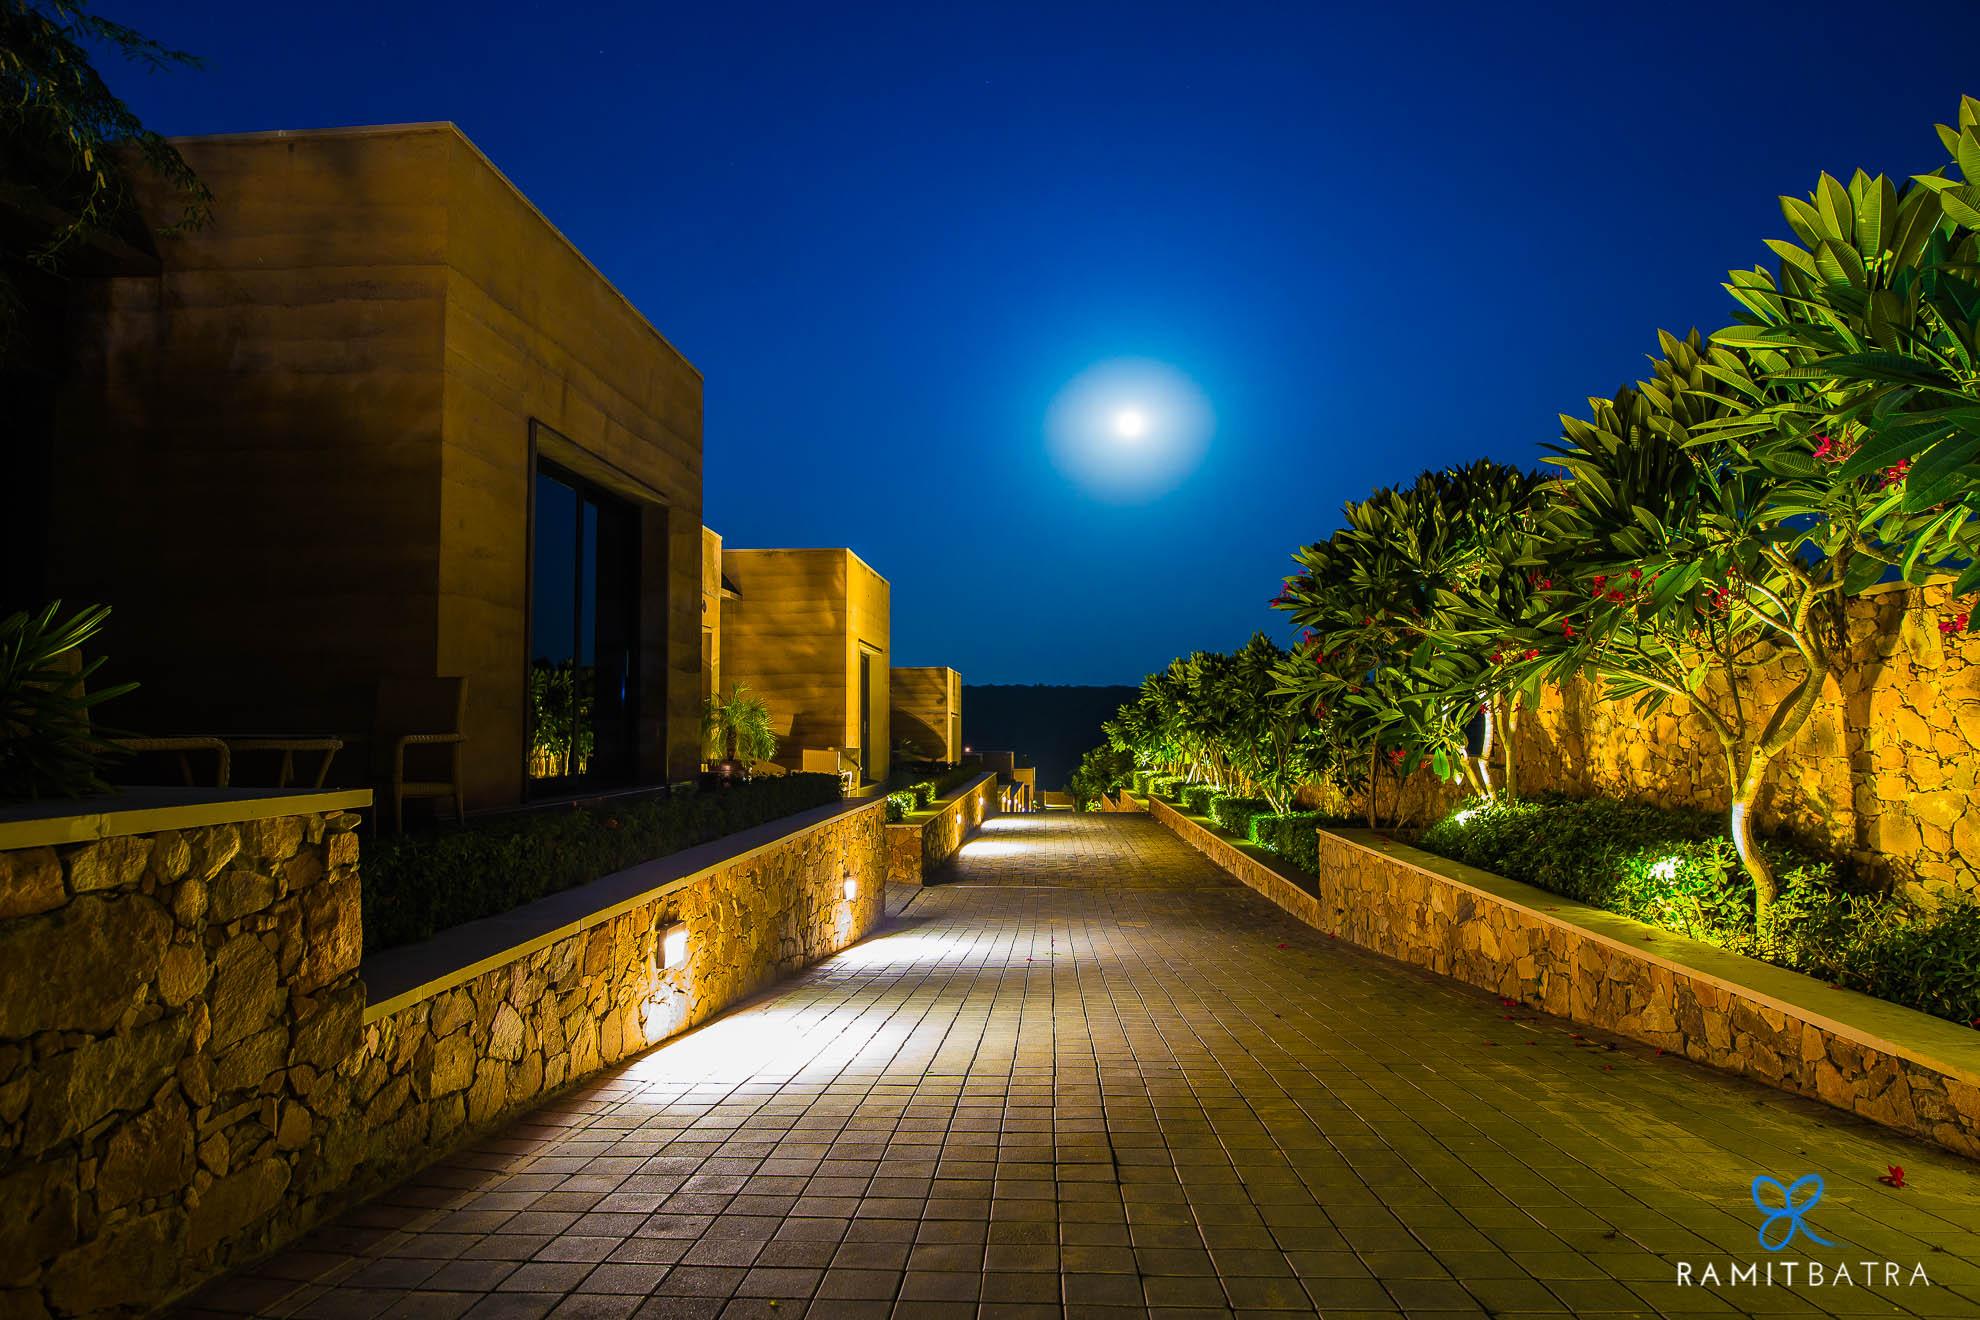 lalit-mangar-hotel-near-delhi-ramitbatra-035